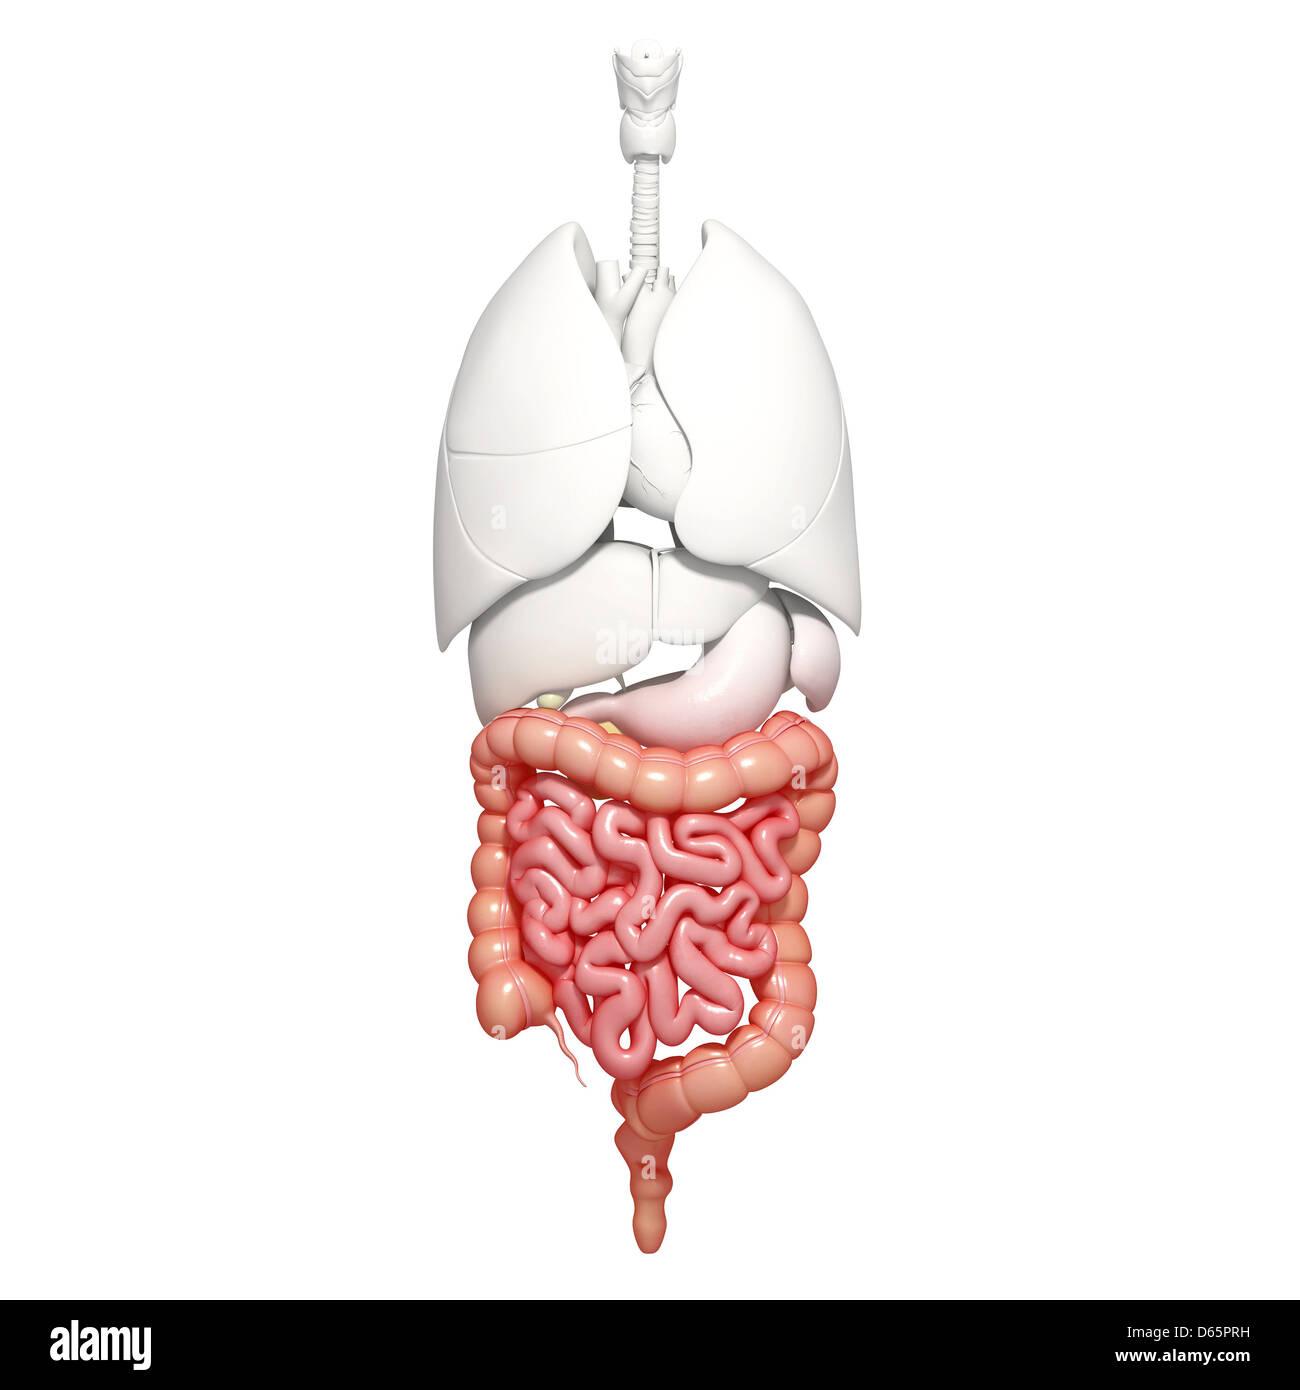 Gesunder Darm, artwork Stockfoto, Bild: 55446709 - Alamy